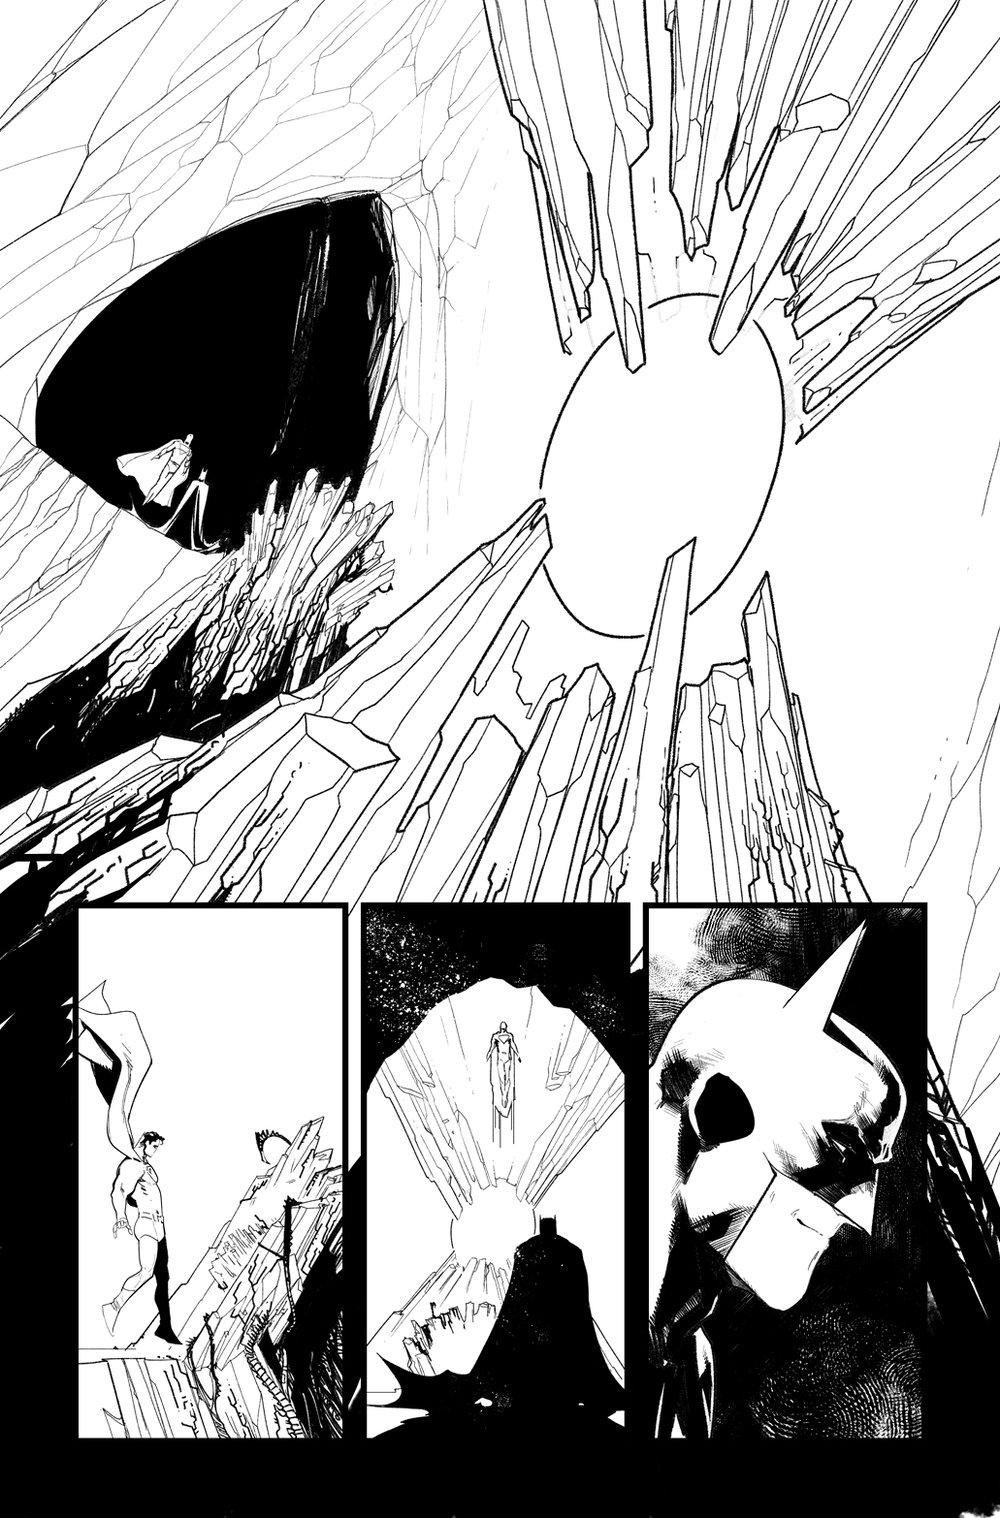 Image of BATMAN/SUPERMAN #4 p.10 ARTIST'S PROOF